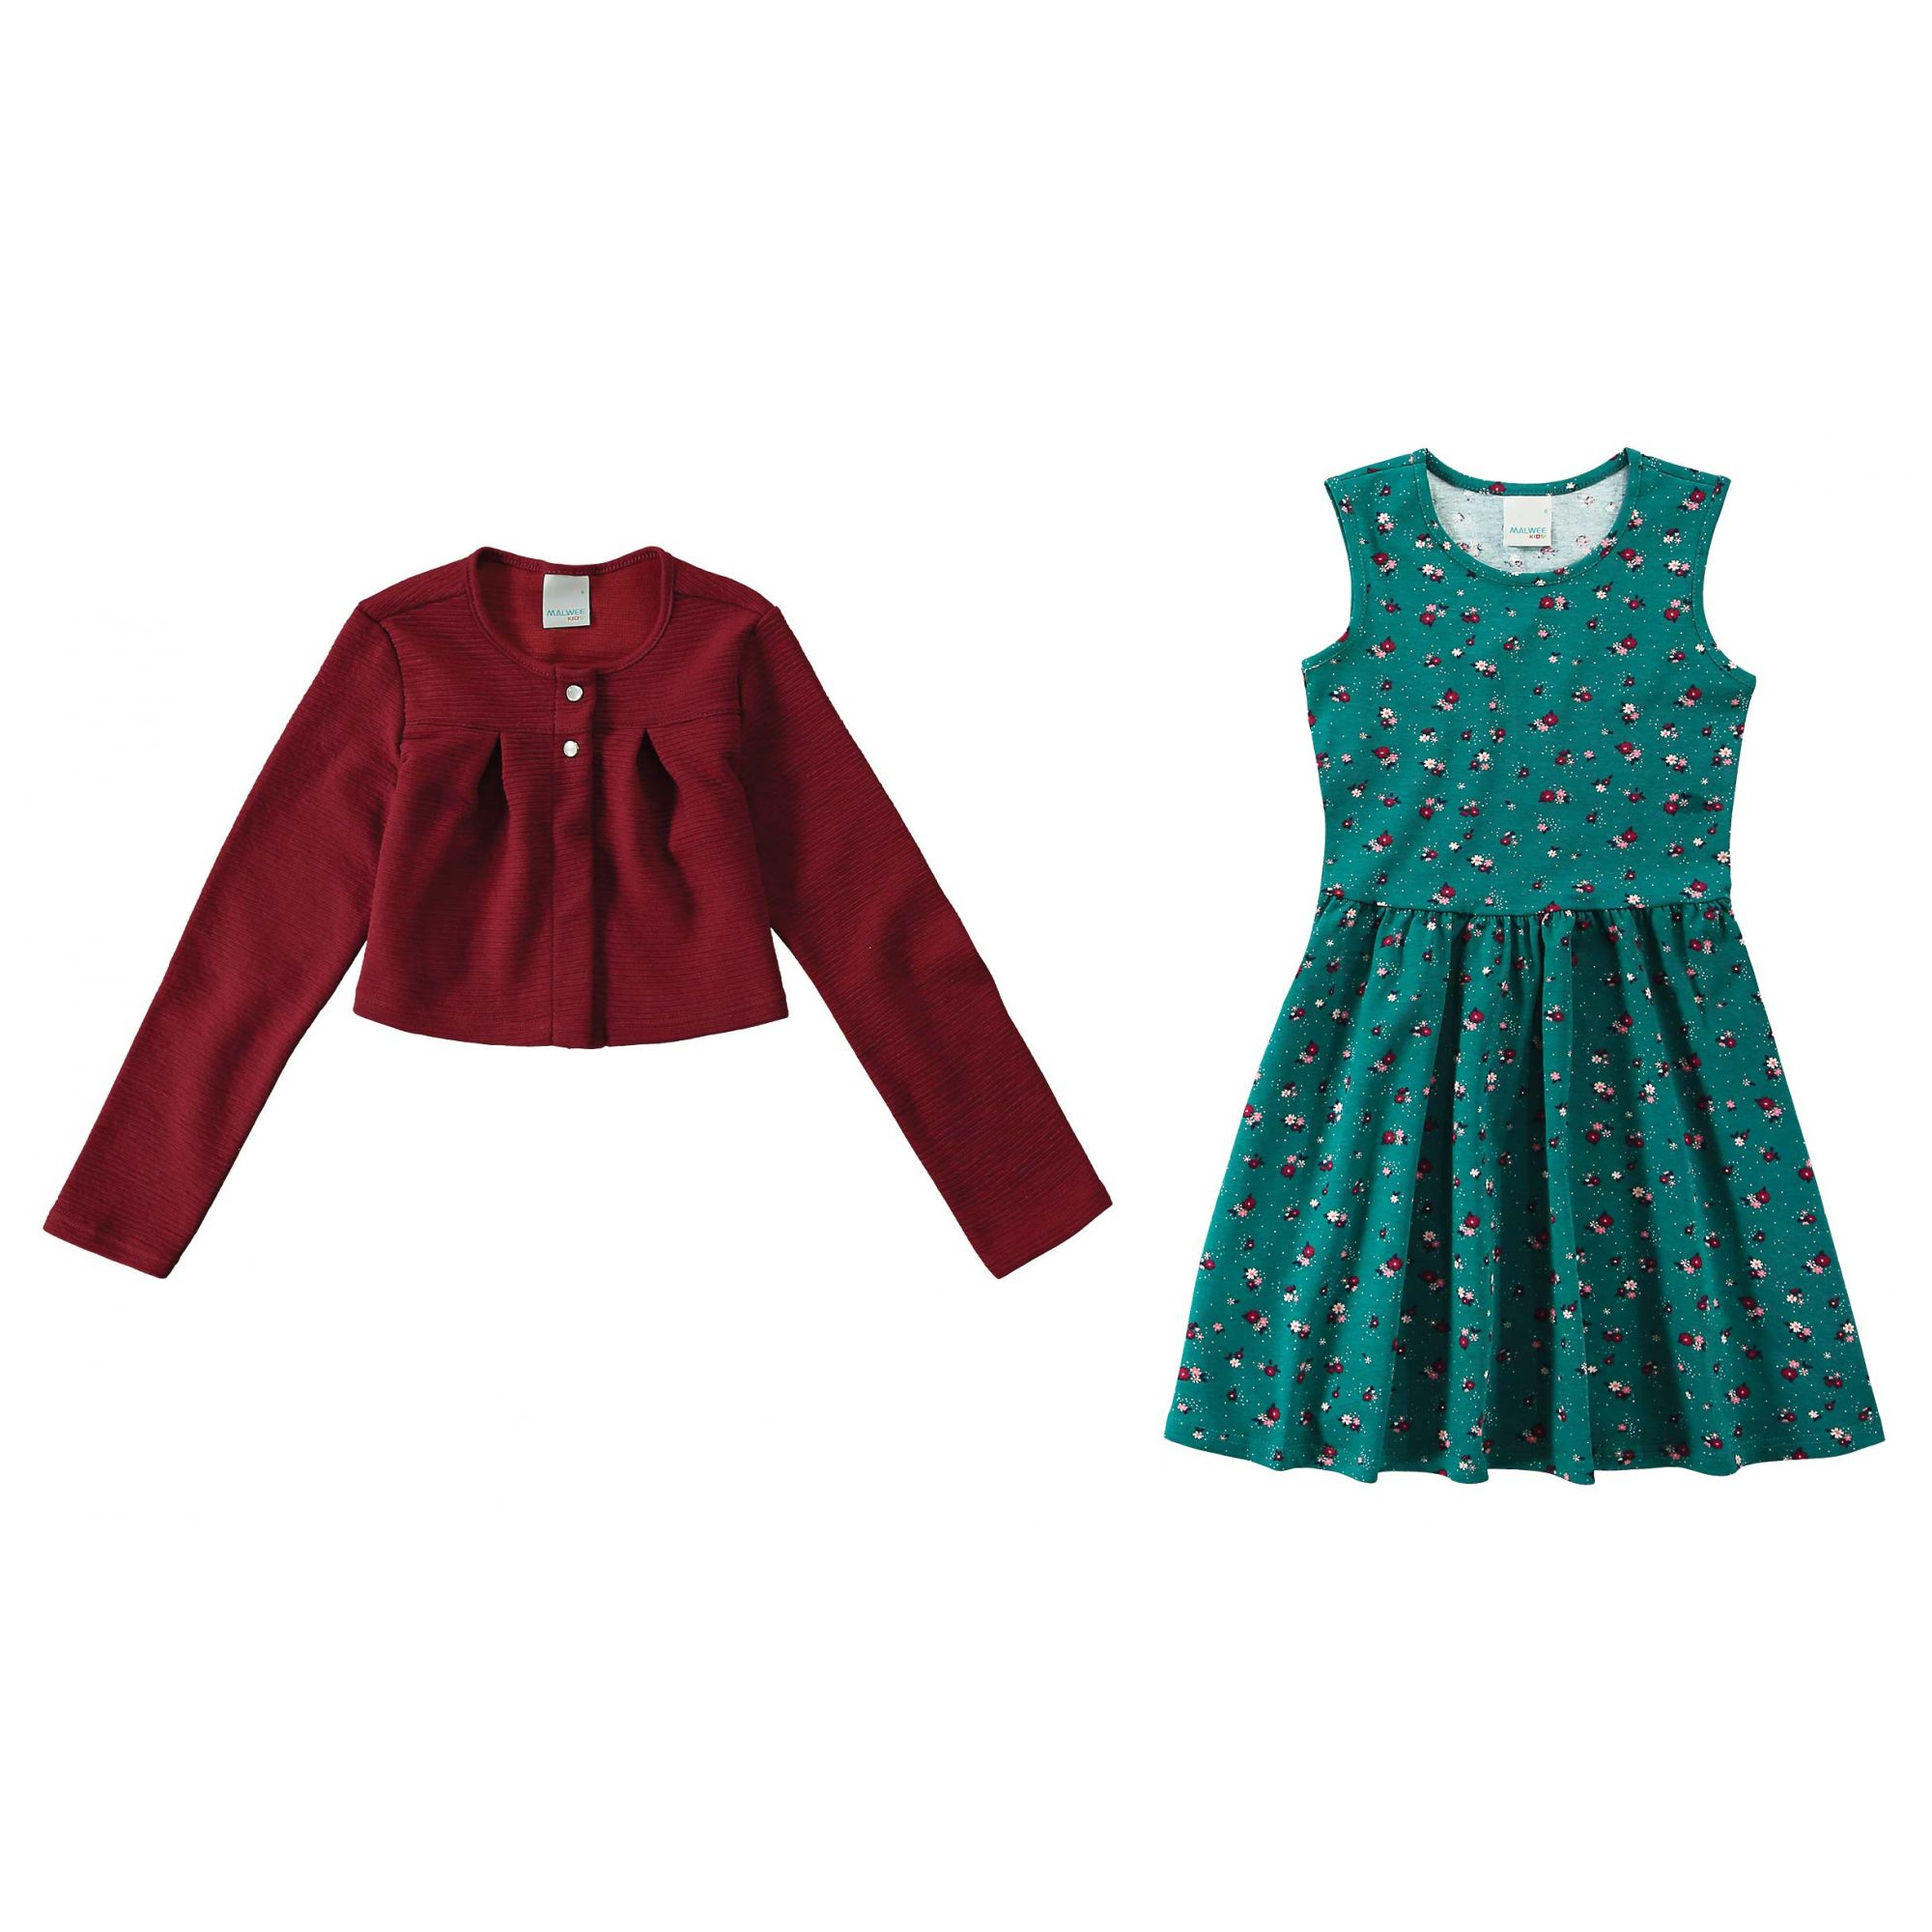 Conjunto Infantil Feminino Inverno Vermelho Flor Malwee